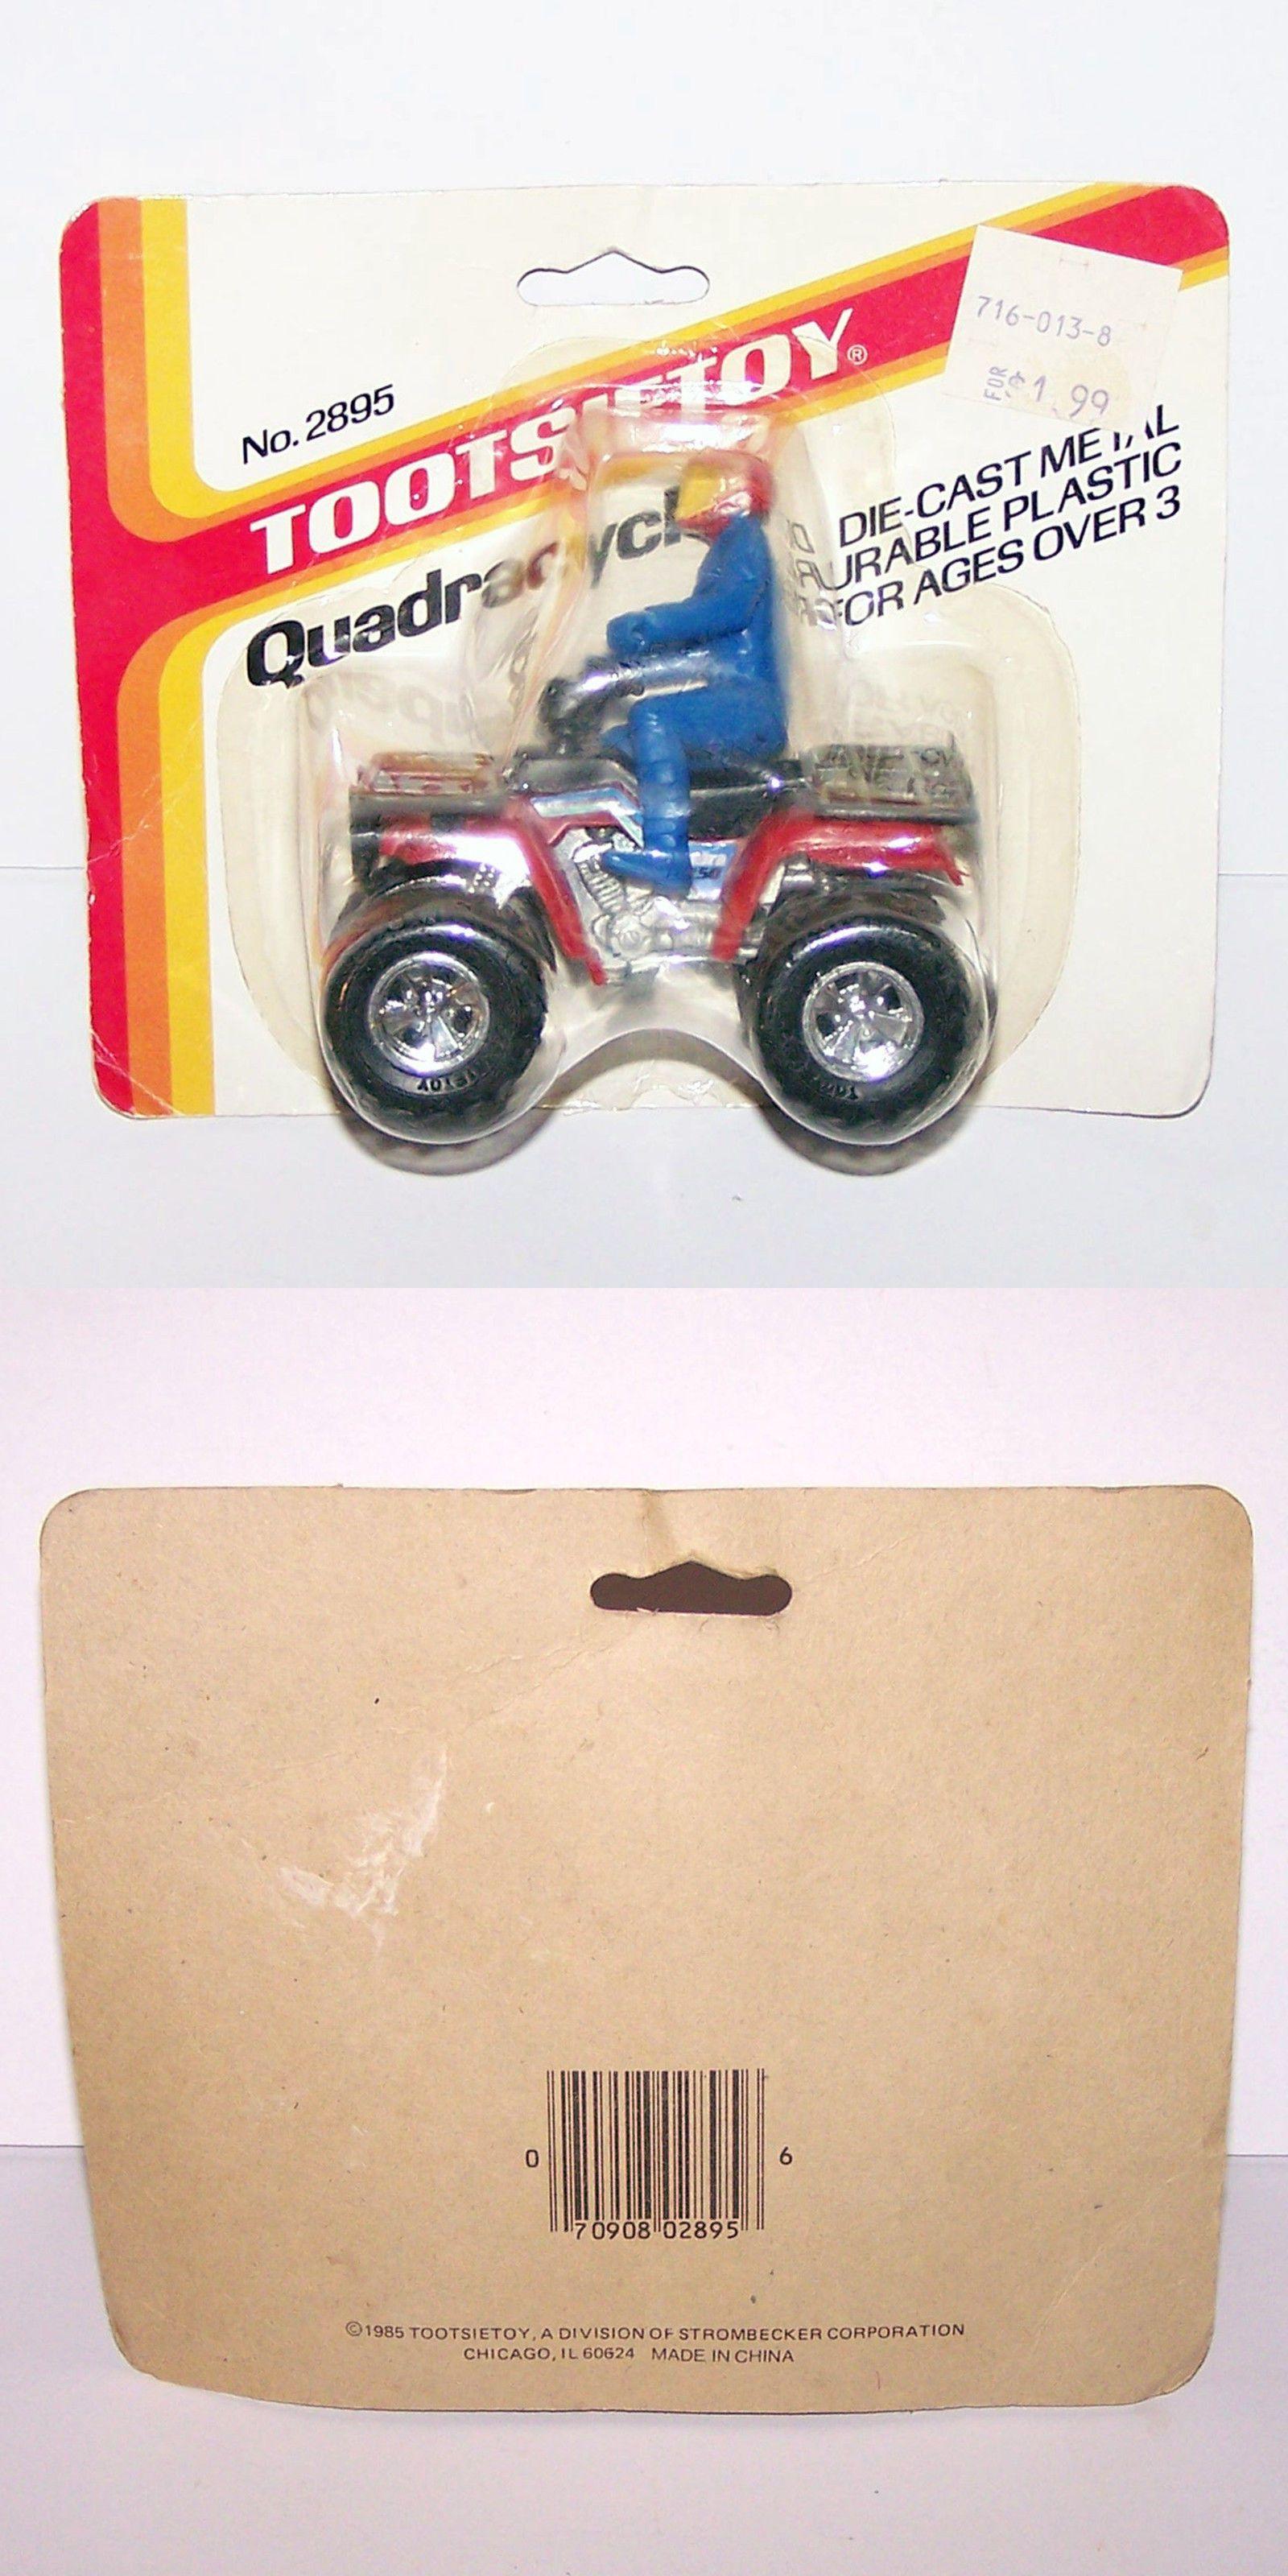 Toys car and bike  NEW  Tootsie Toy Quadracycle ATV Wheeler  Bike Sealed Rare